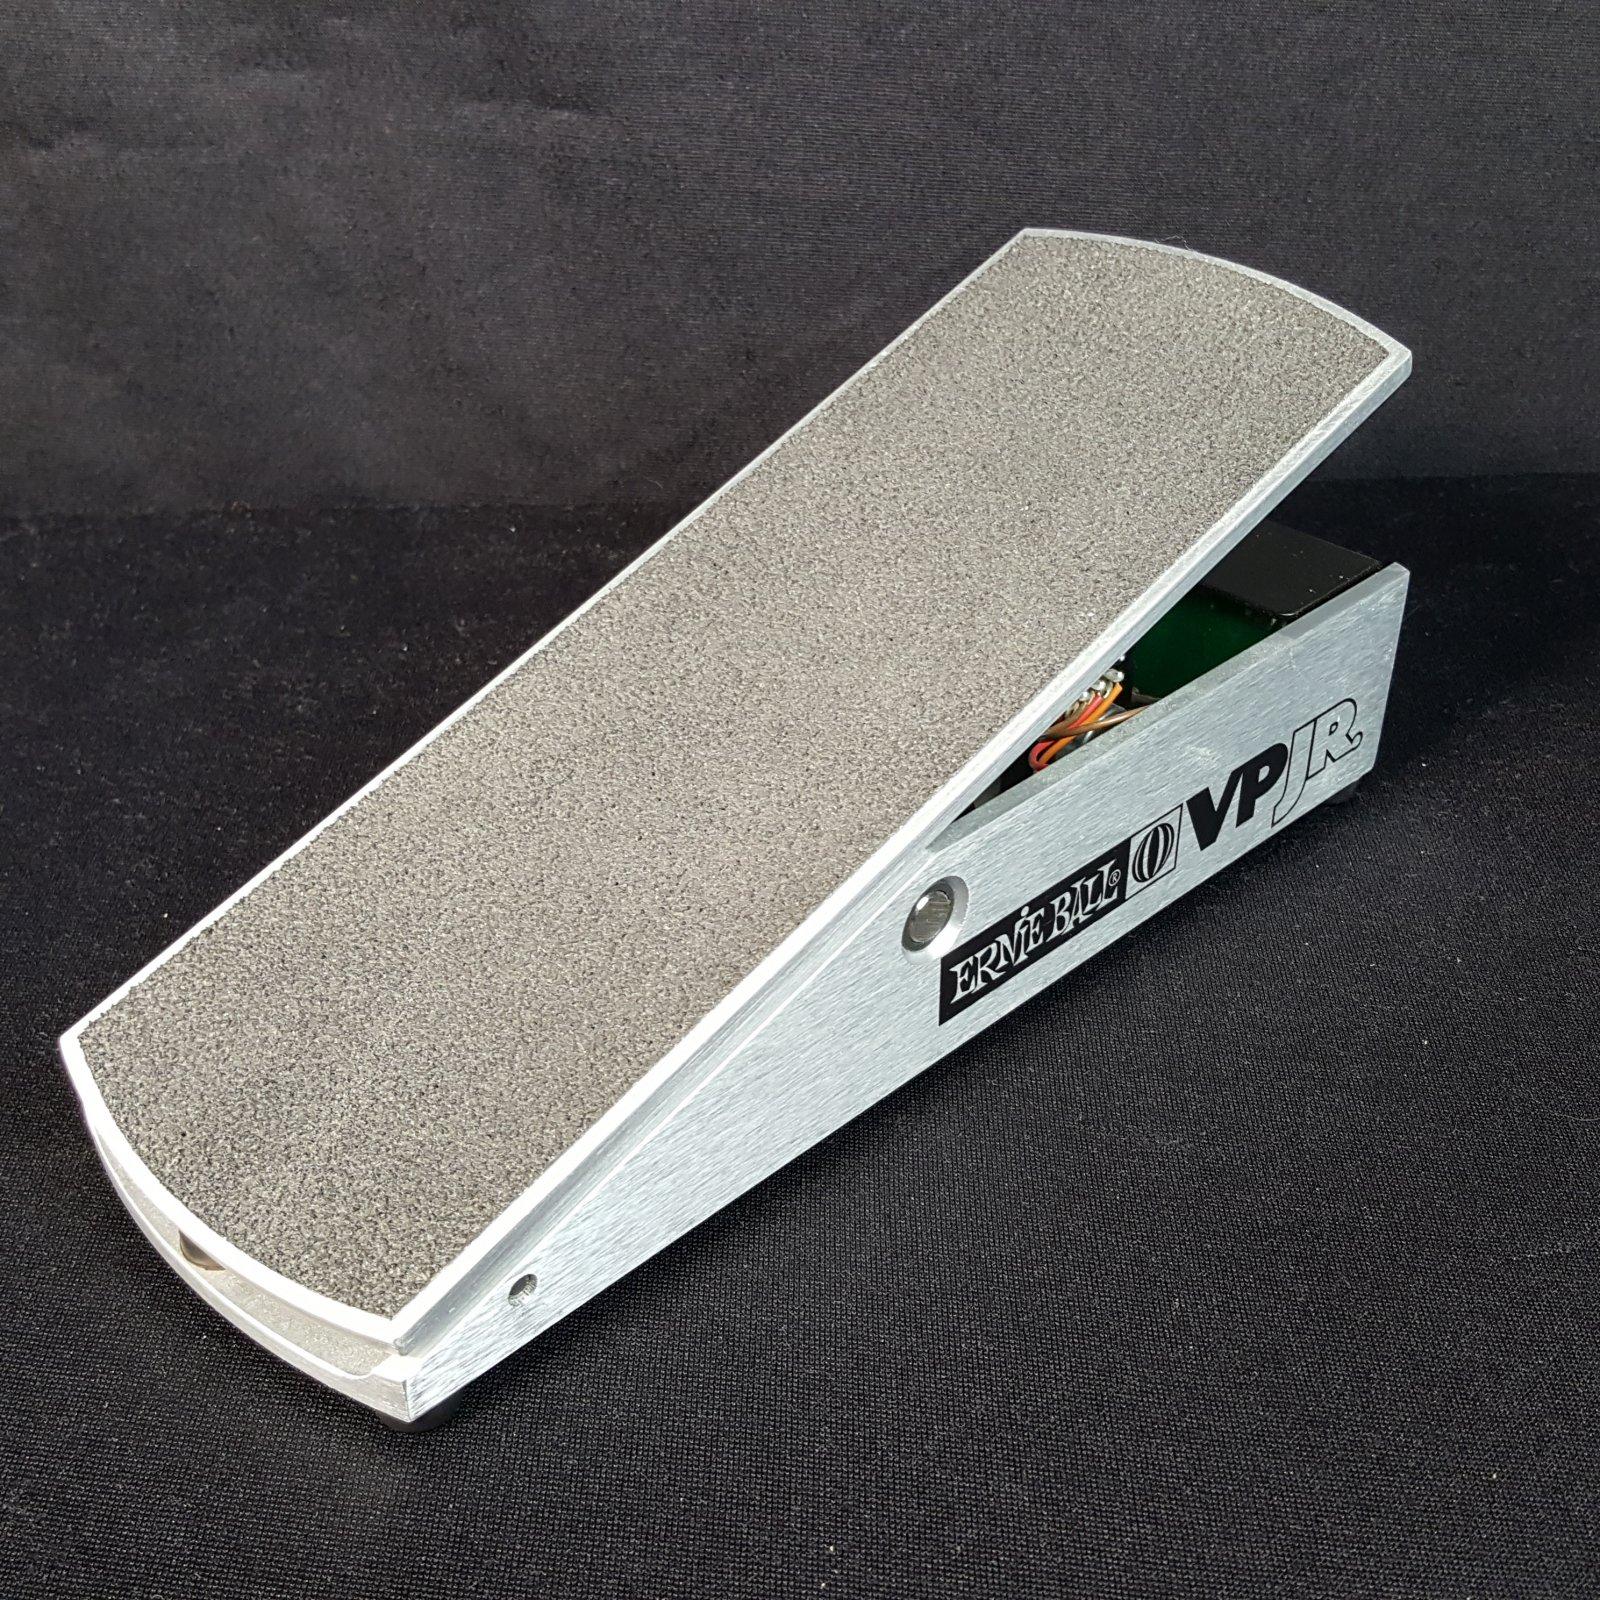 USED Ernie Ball 25k Volume Pedal